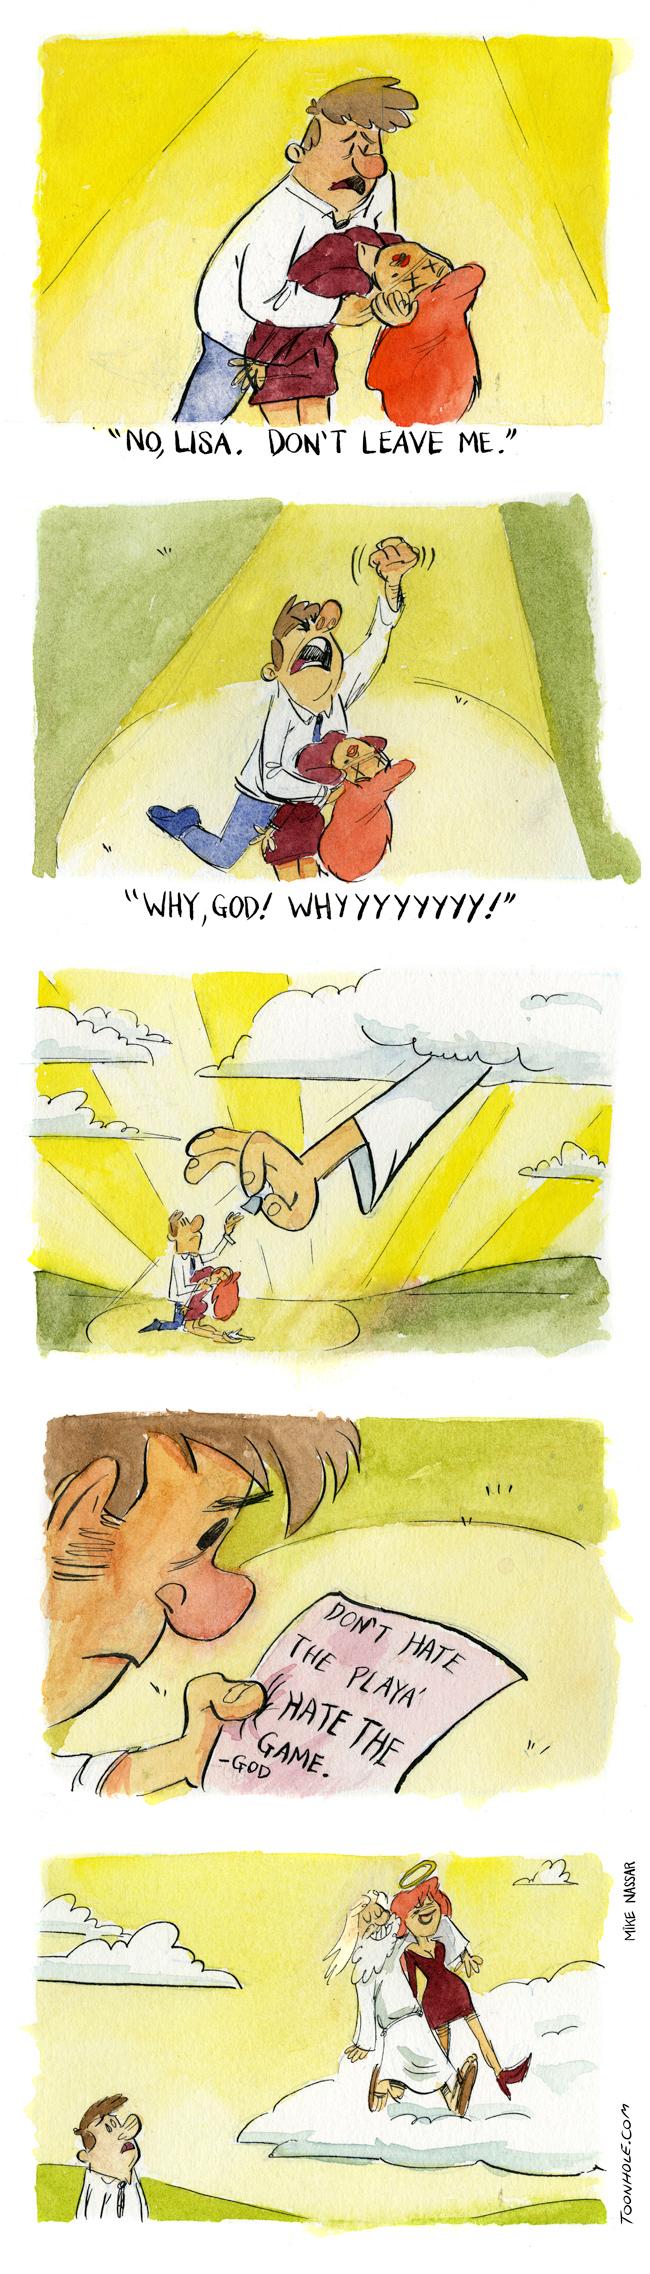 Why God?!